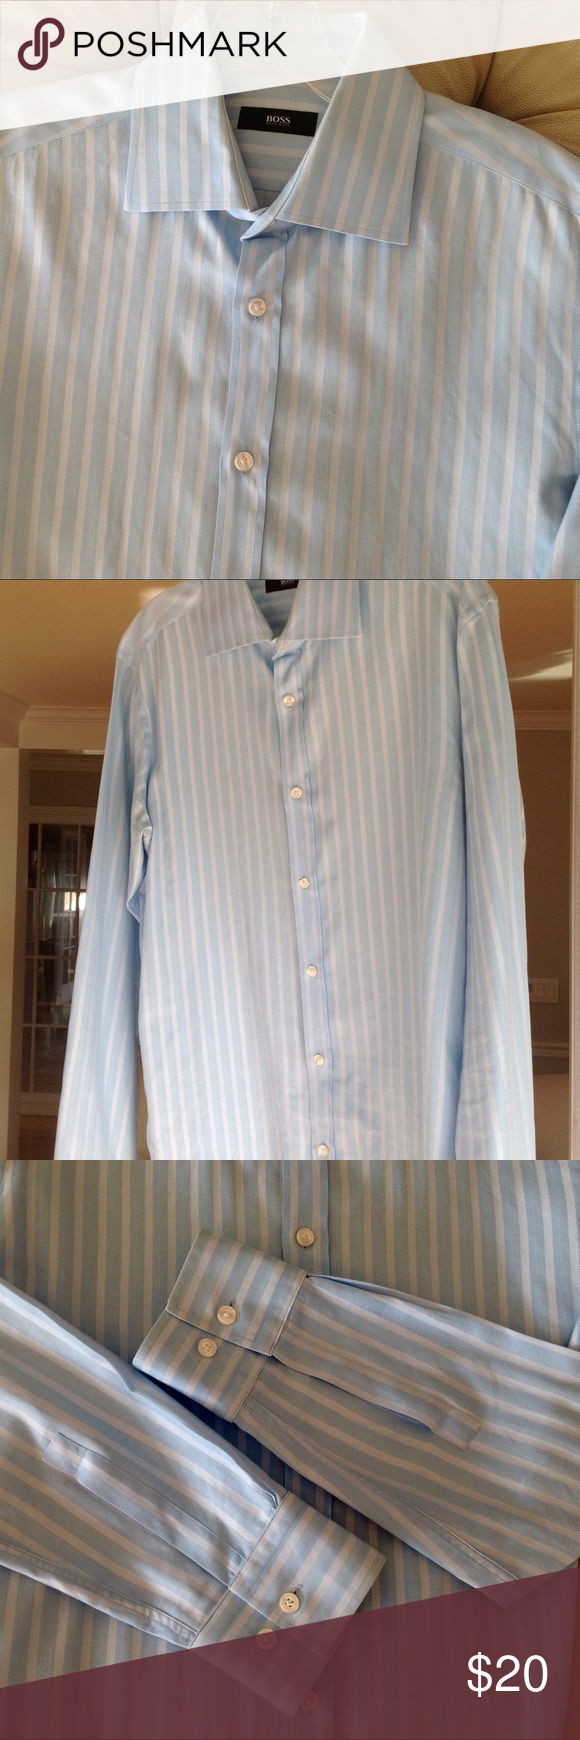 04c60e40 Men's Hugo Boss Dress Shirt Men's button down dress shirt in sky blue and  white stripe. Great condition. Hugo Boss Shirts Dress Shirts. SALE!